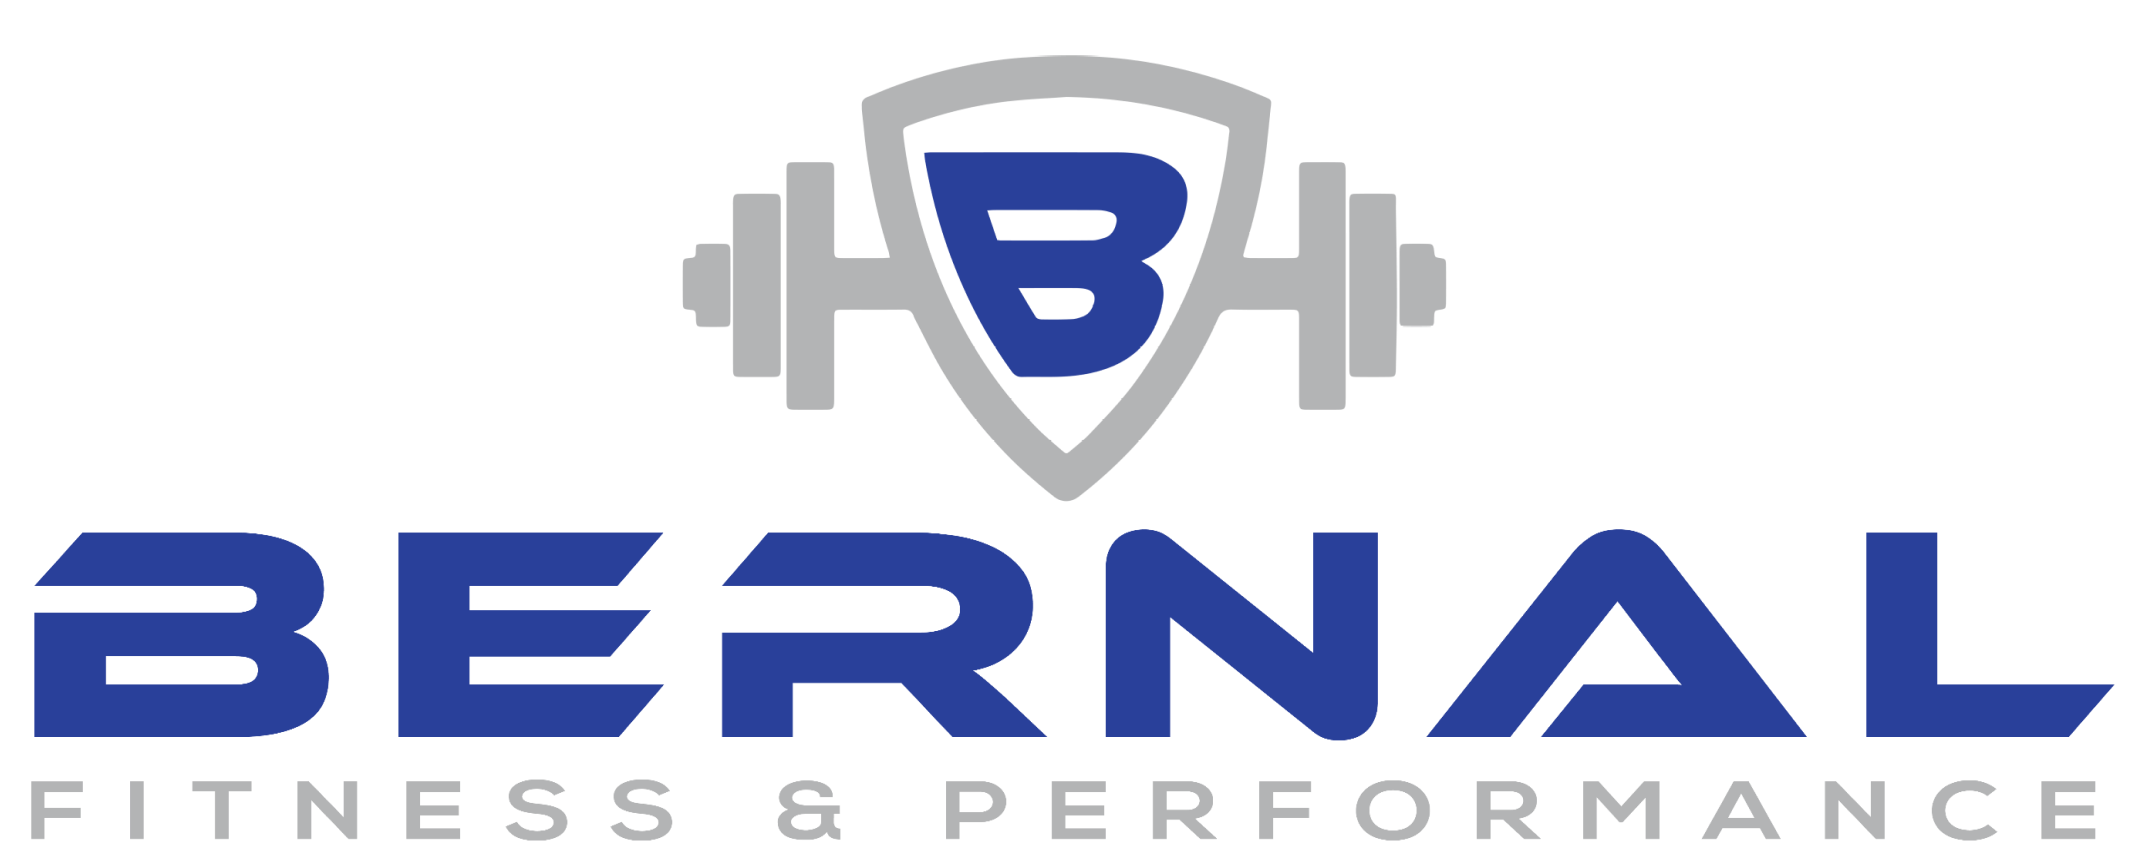 Bernal Fitness & Performance